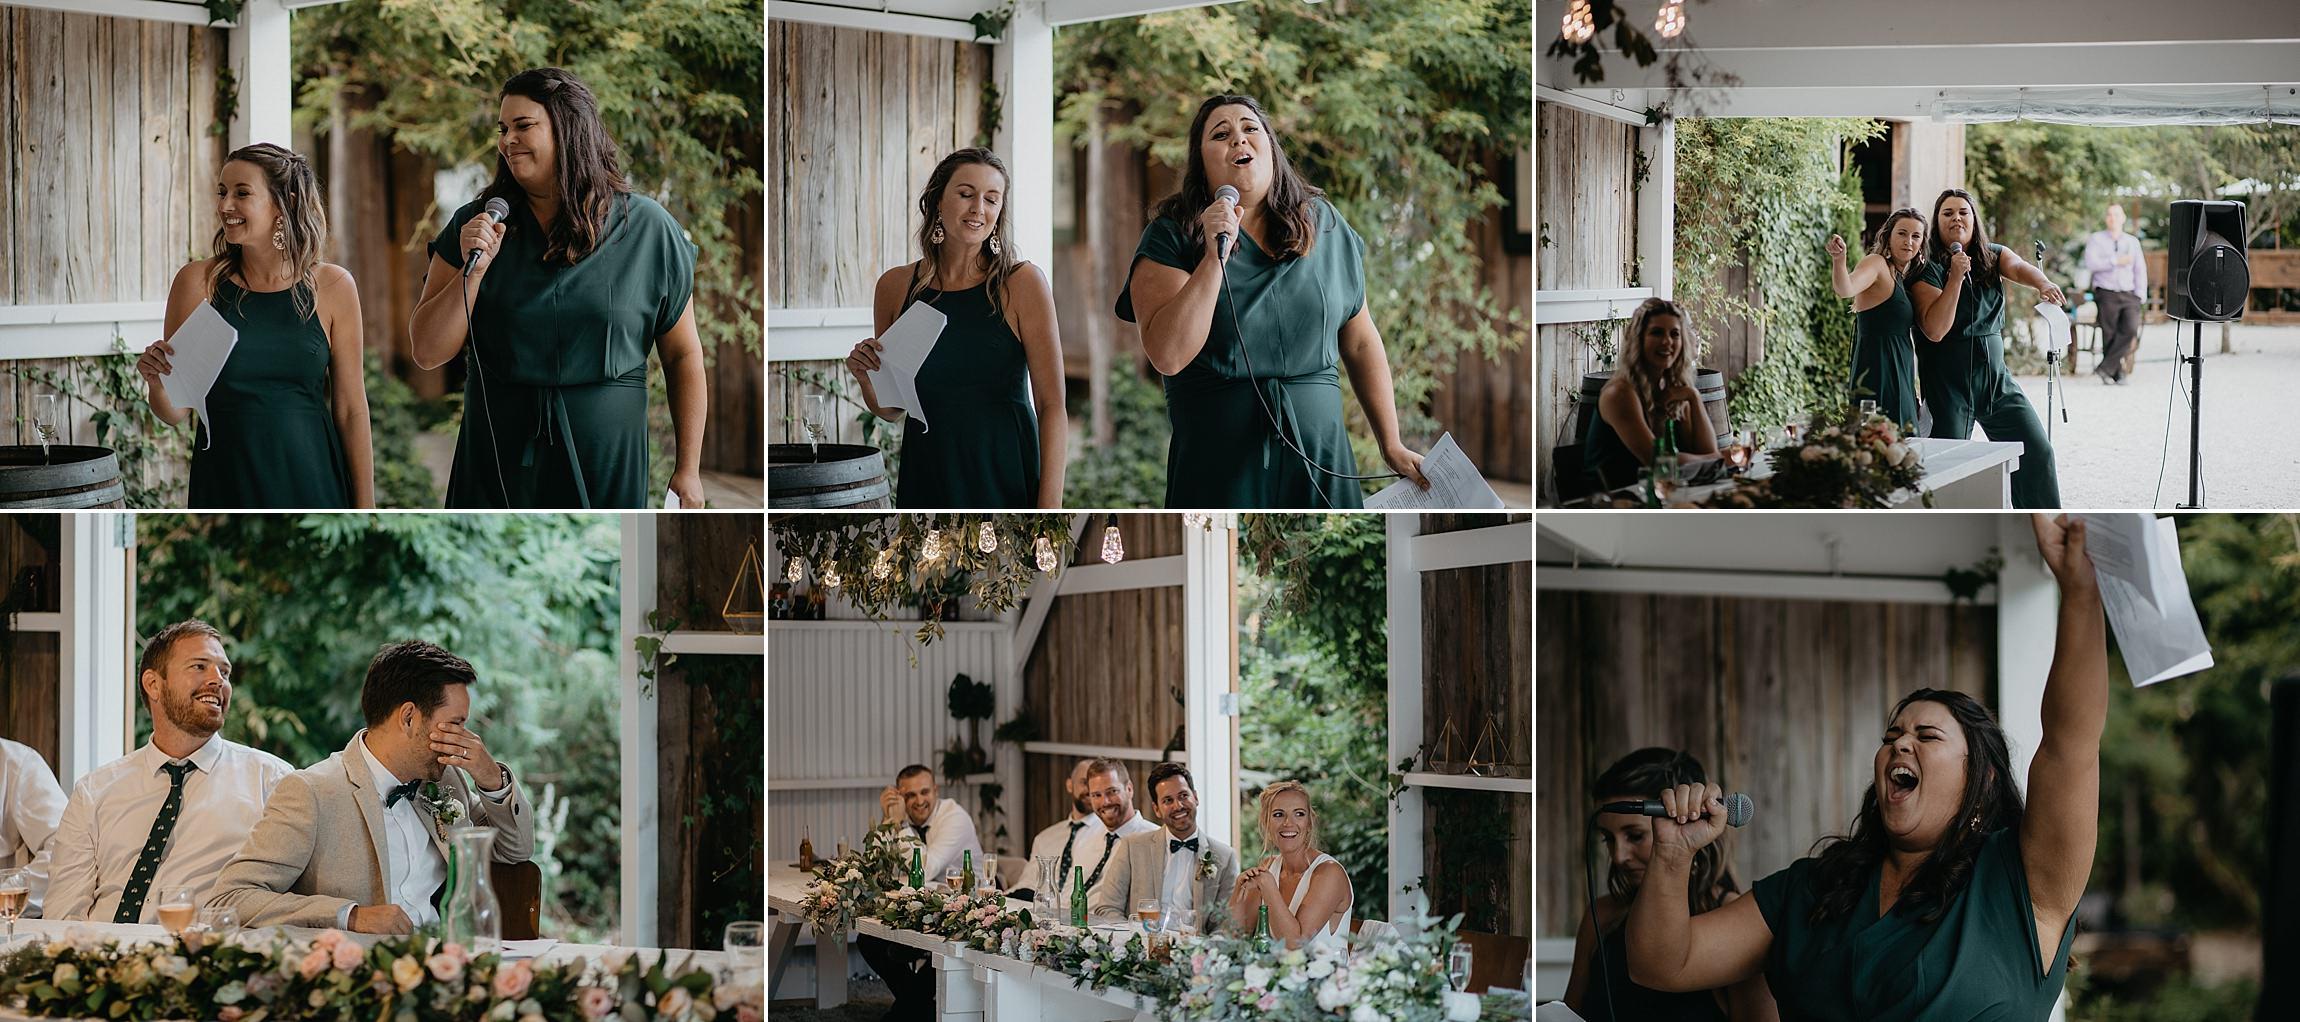 oldforestschool-wedding-blog-177.jpg